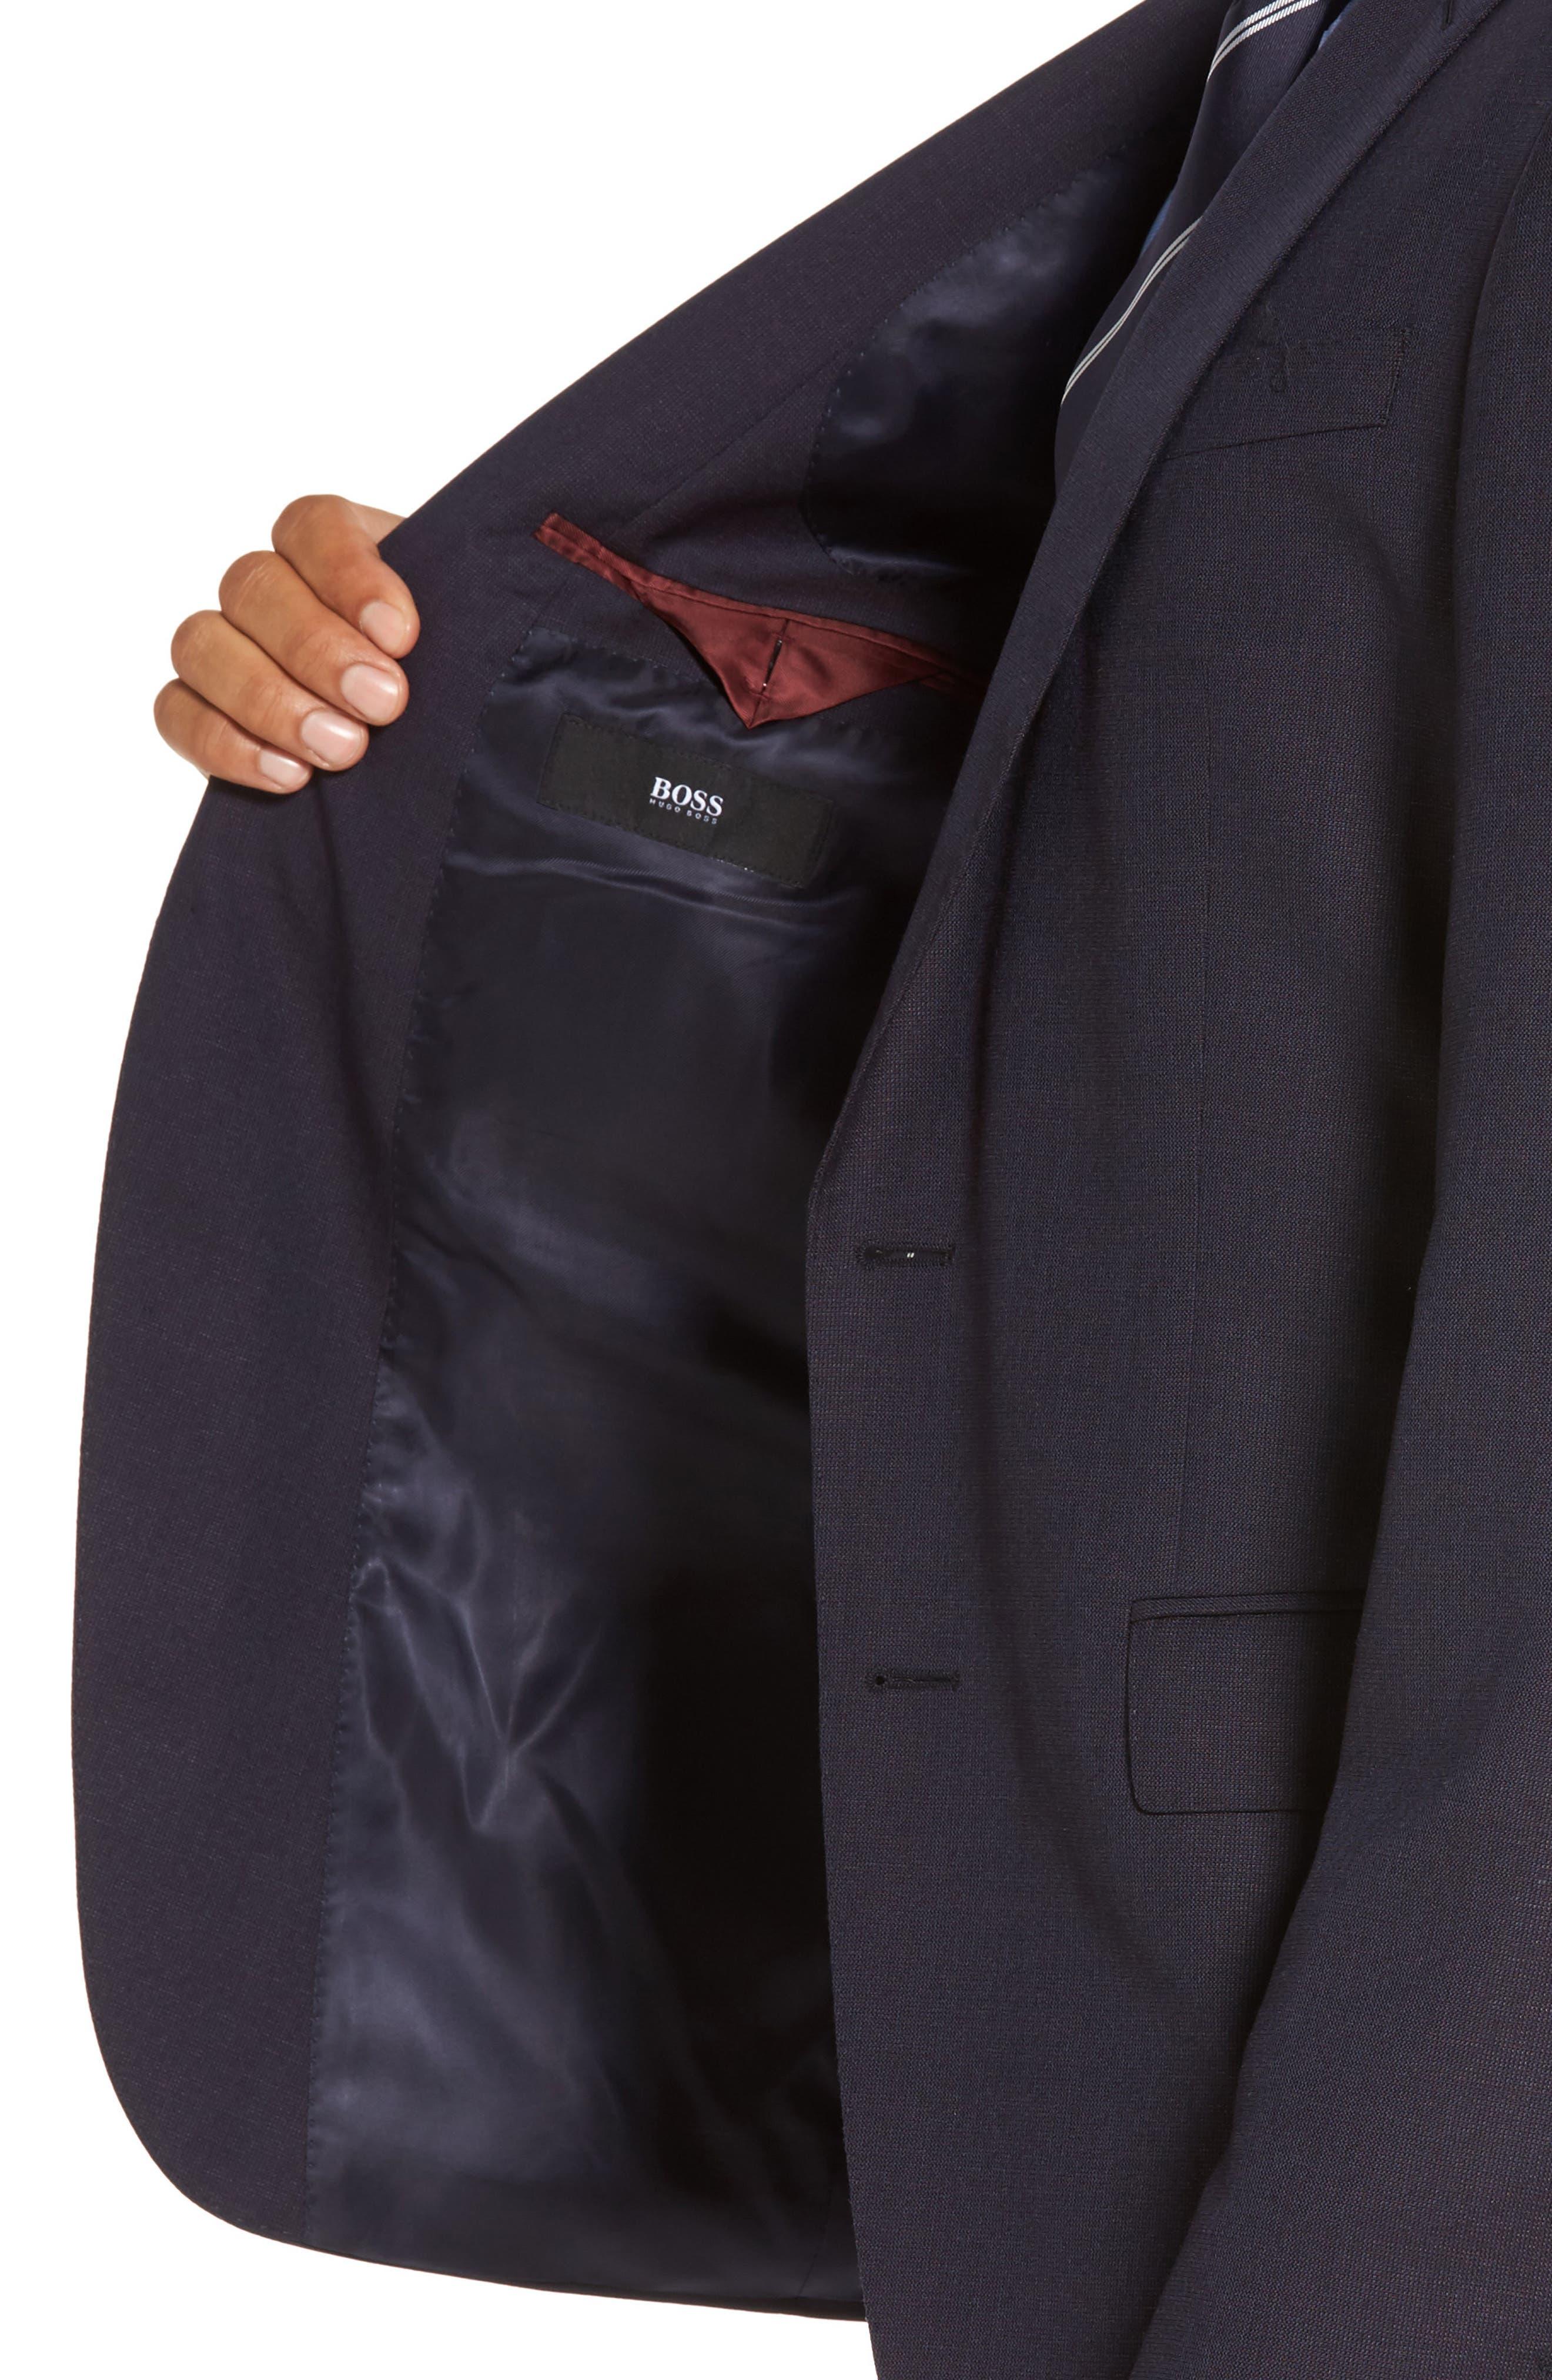 Huge/Genius Trim Fit Wool Suit,                             Alternate thumbnail 4, color,                             606